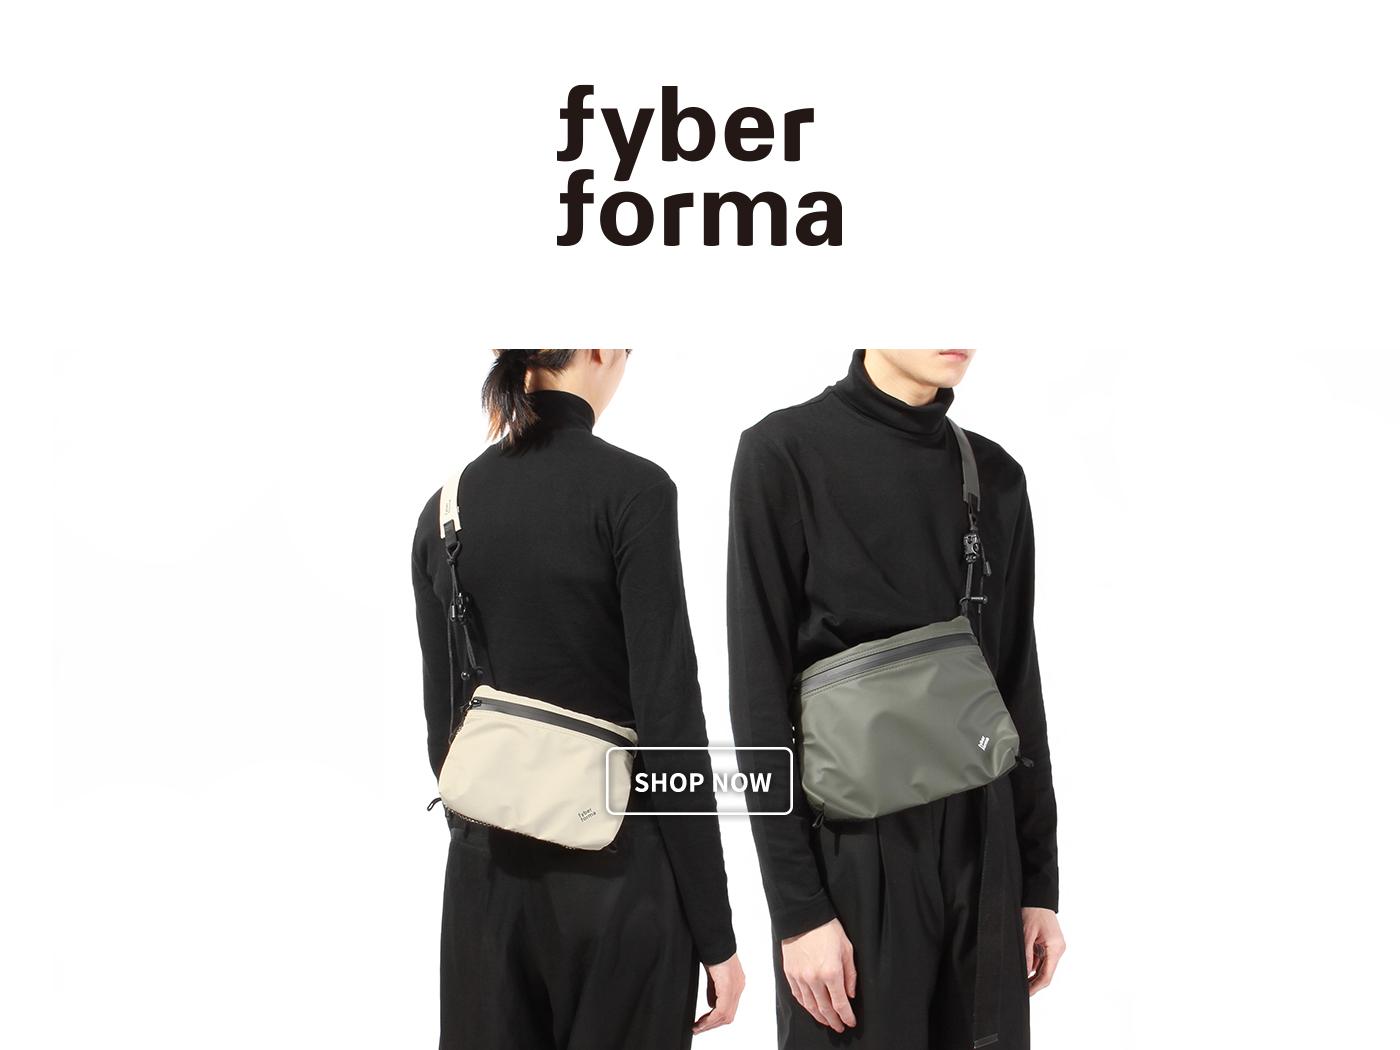 fyber forma,fyber forma隨行包,泰維克,Tyvek®,都會包,機能包,Urban